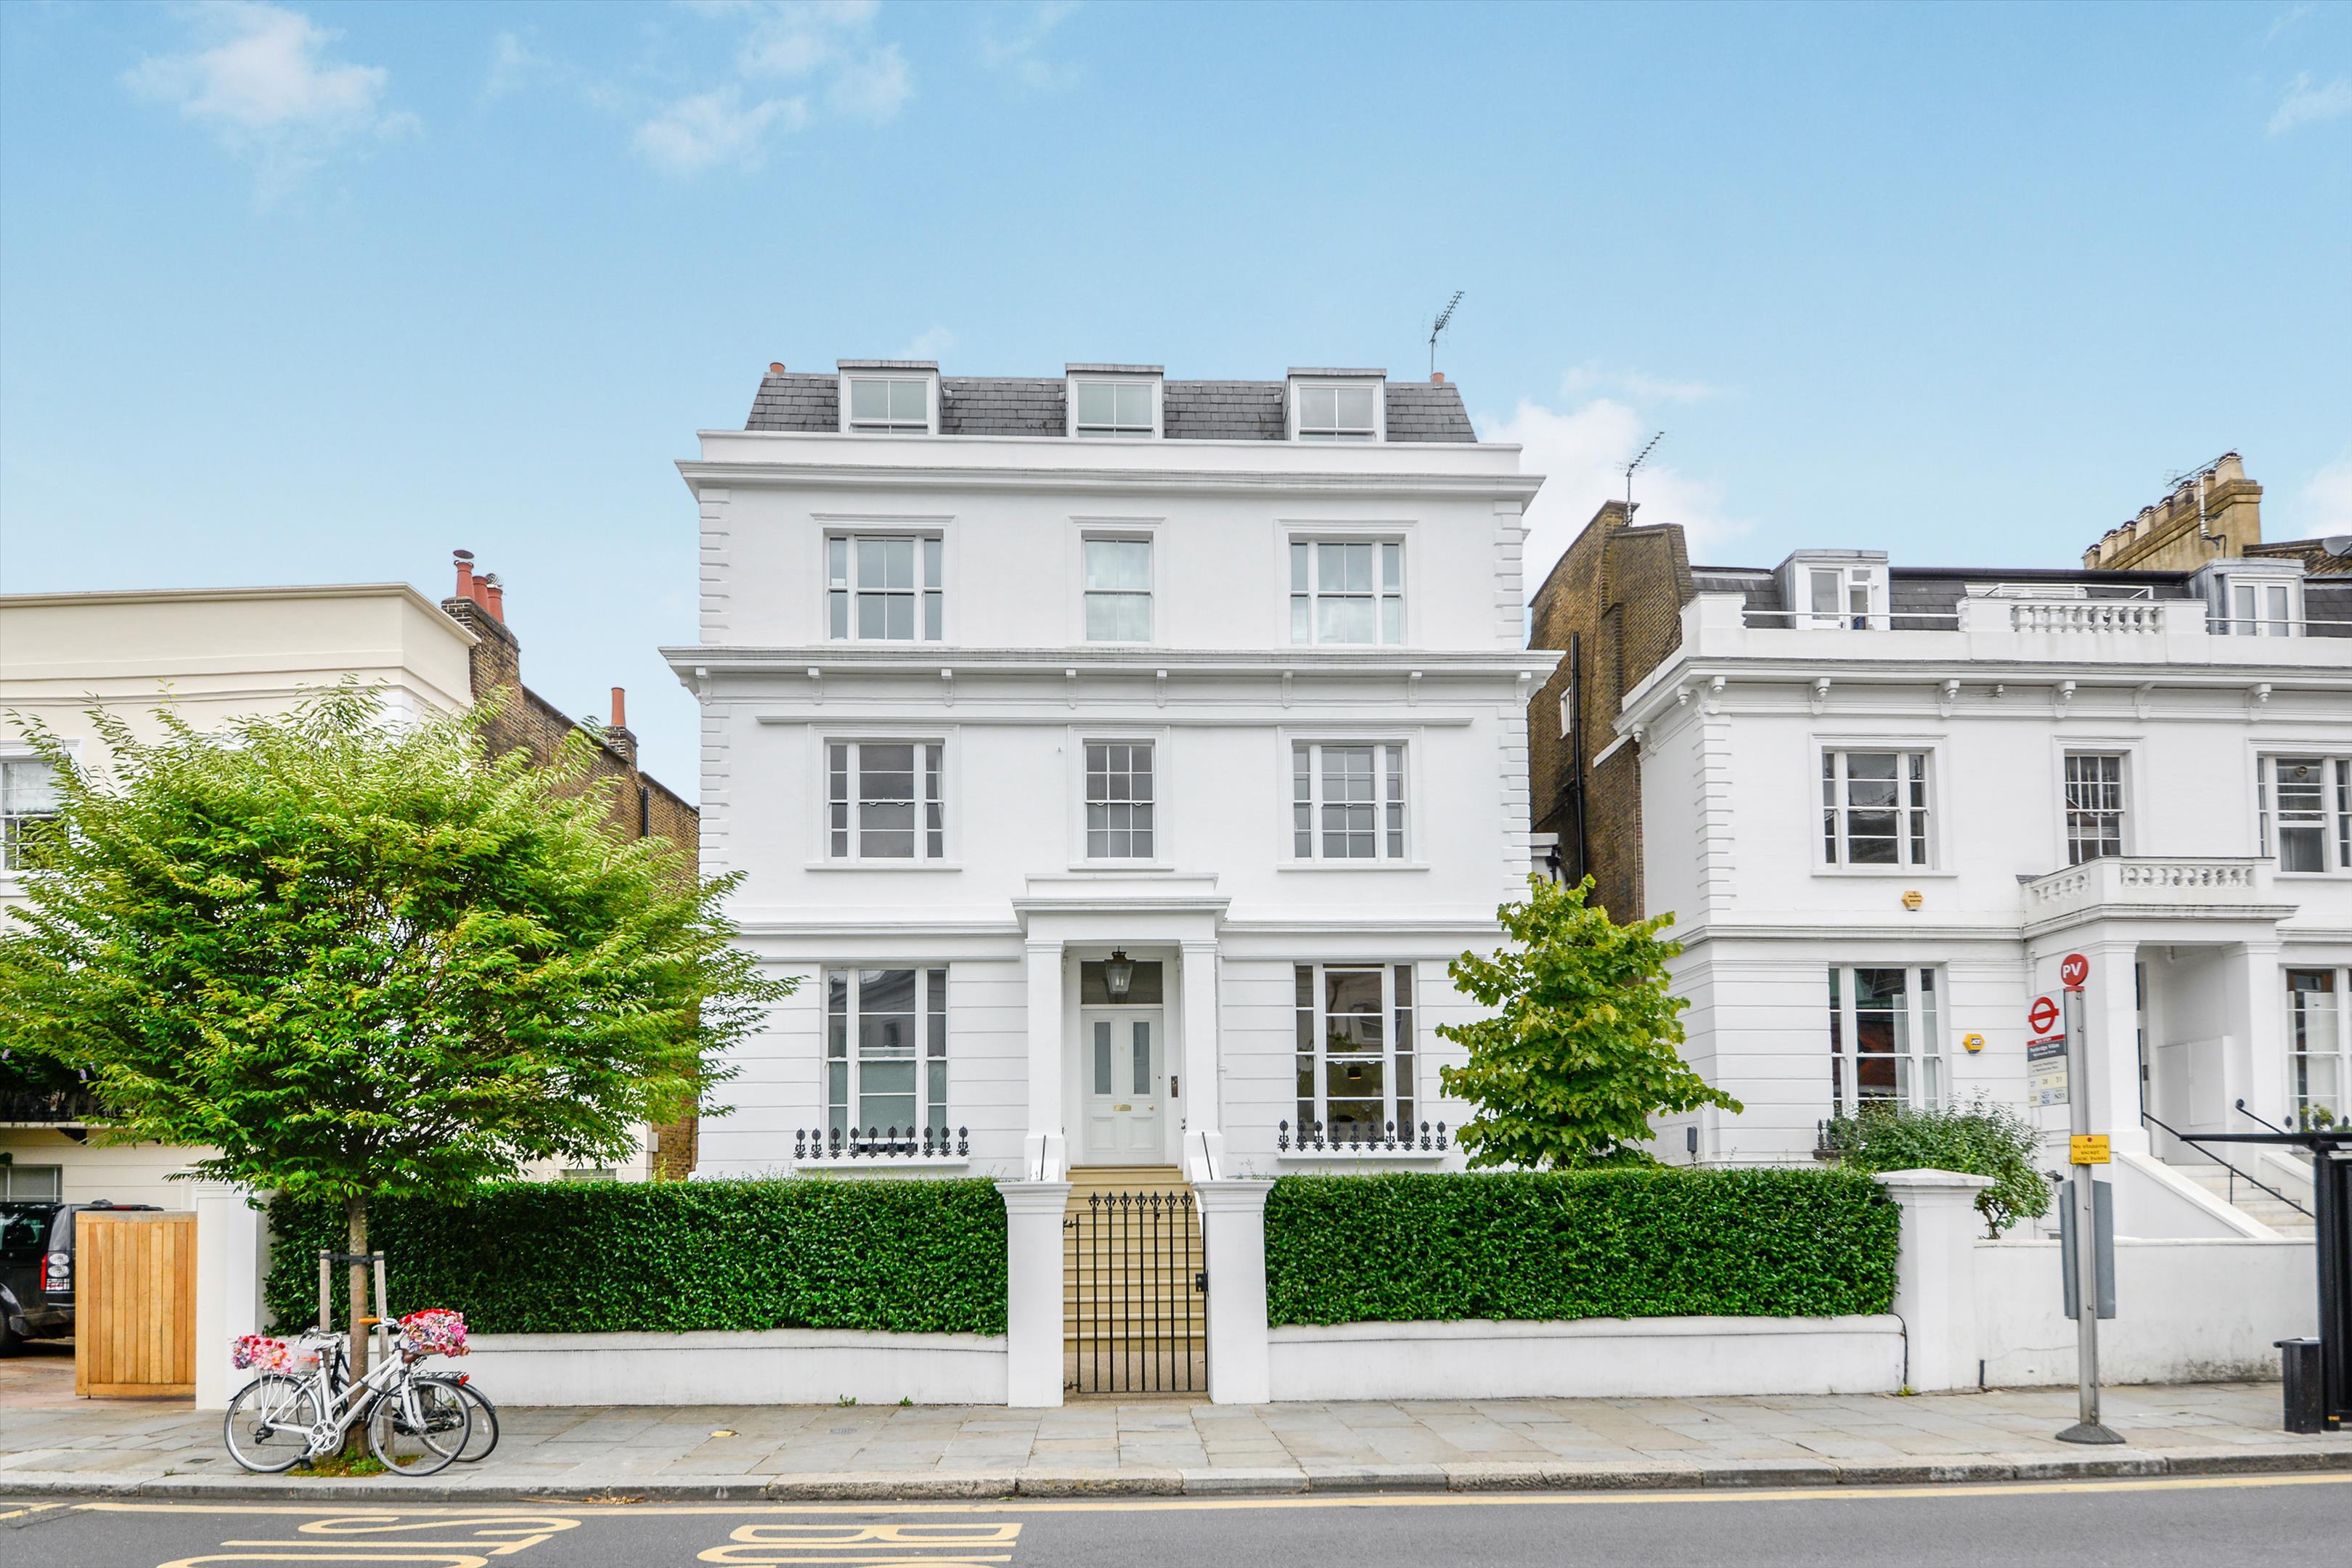 Pembridge Villas, London W11, UK - Source: Knight Frank